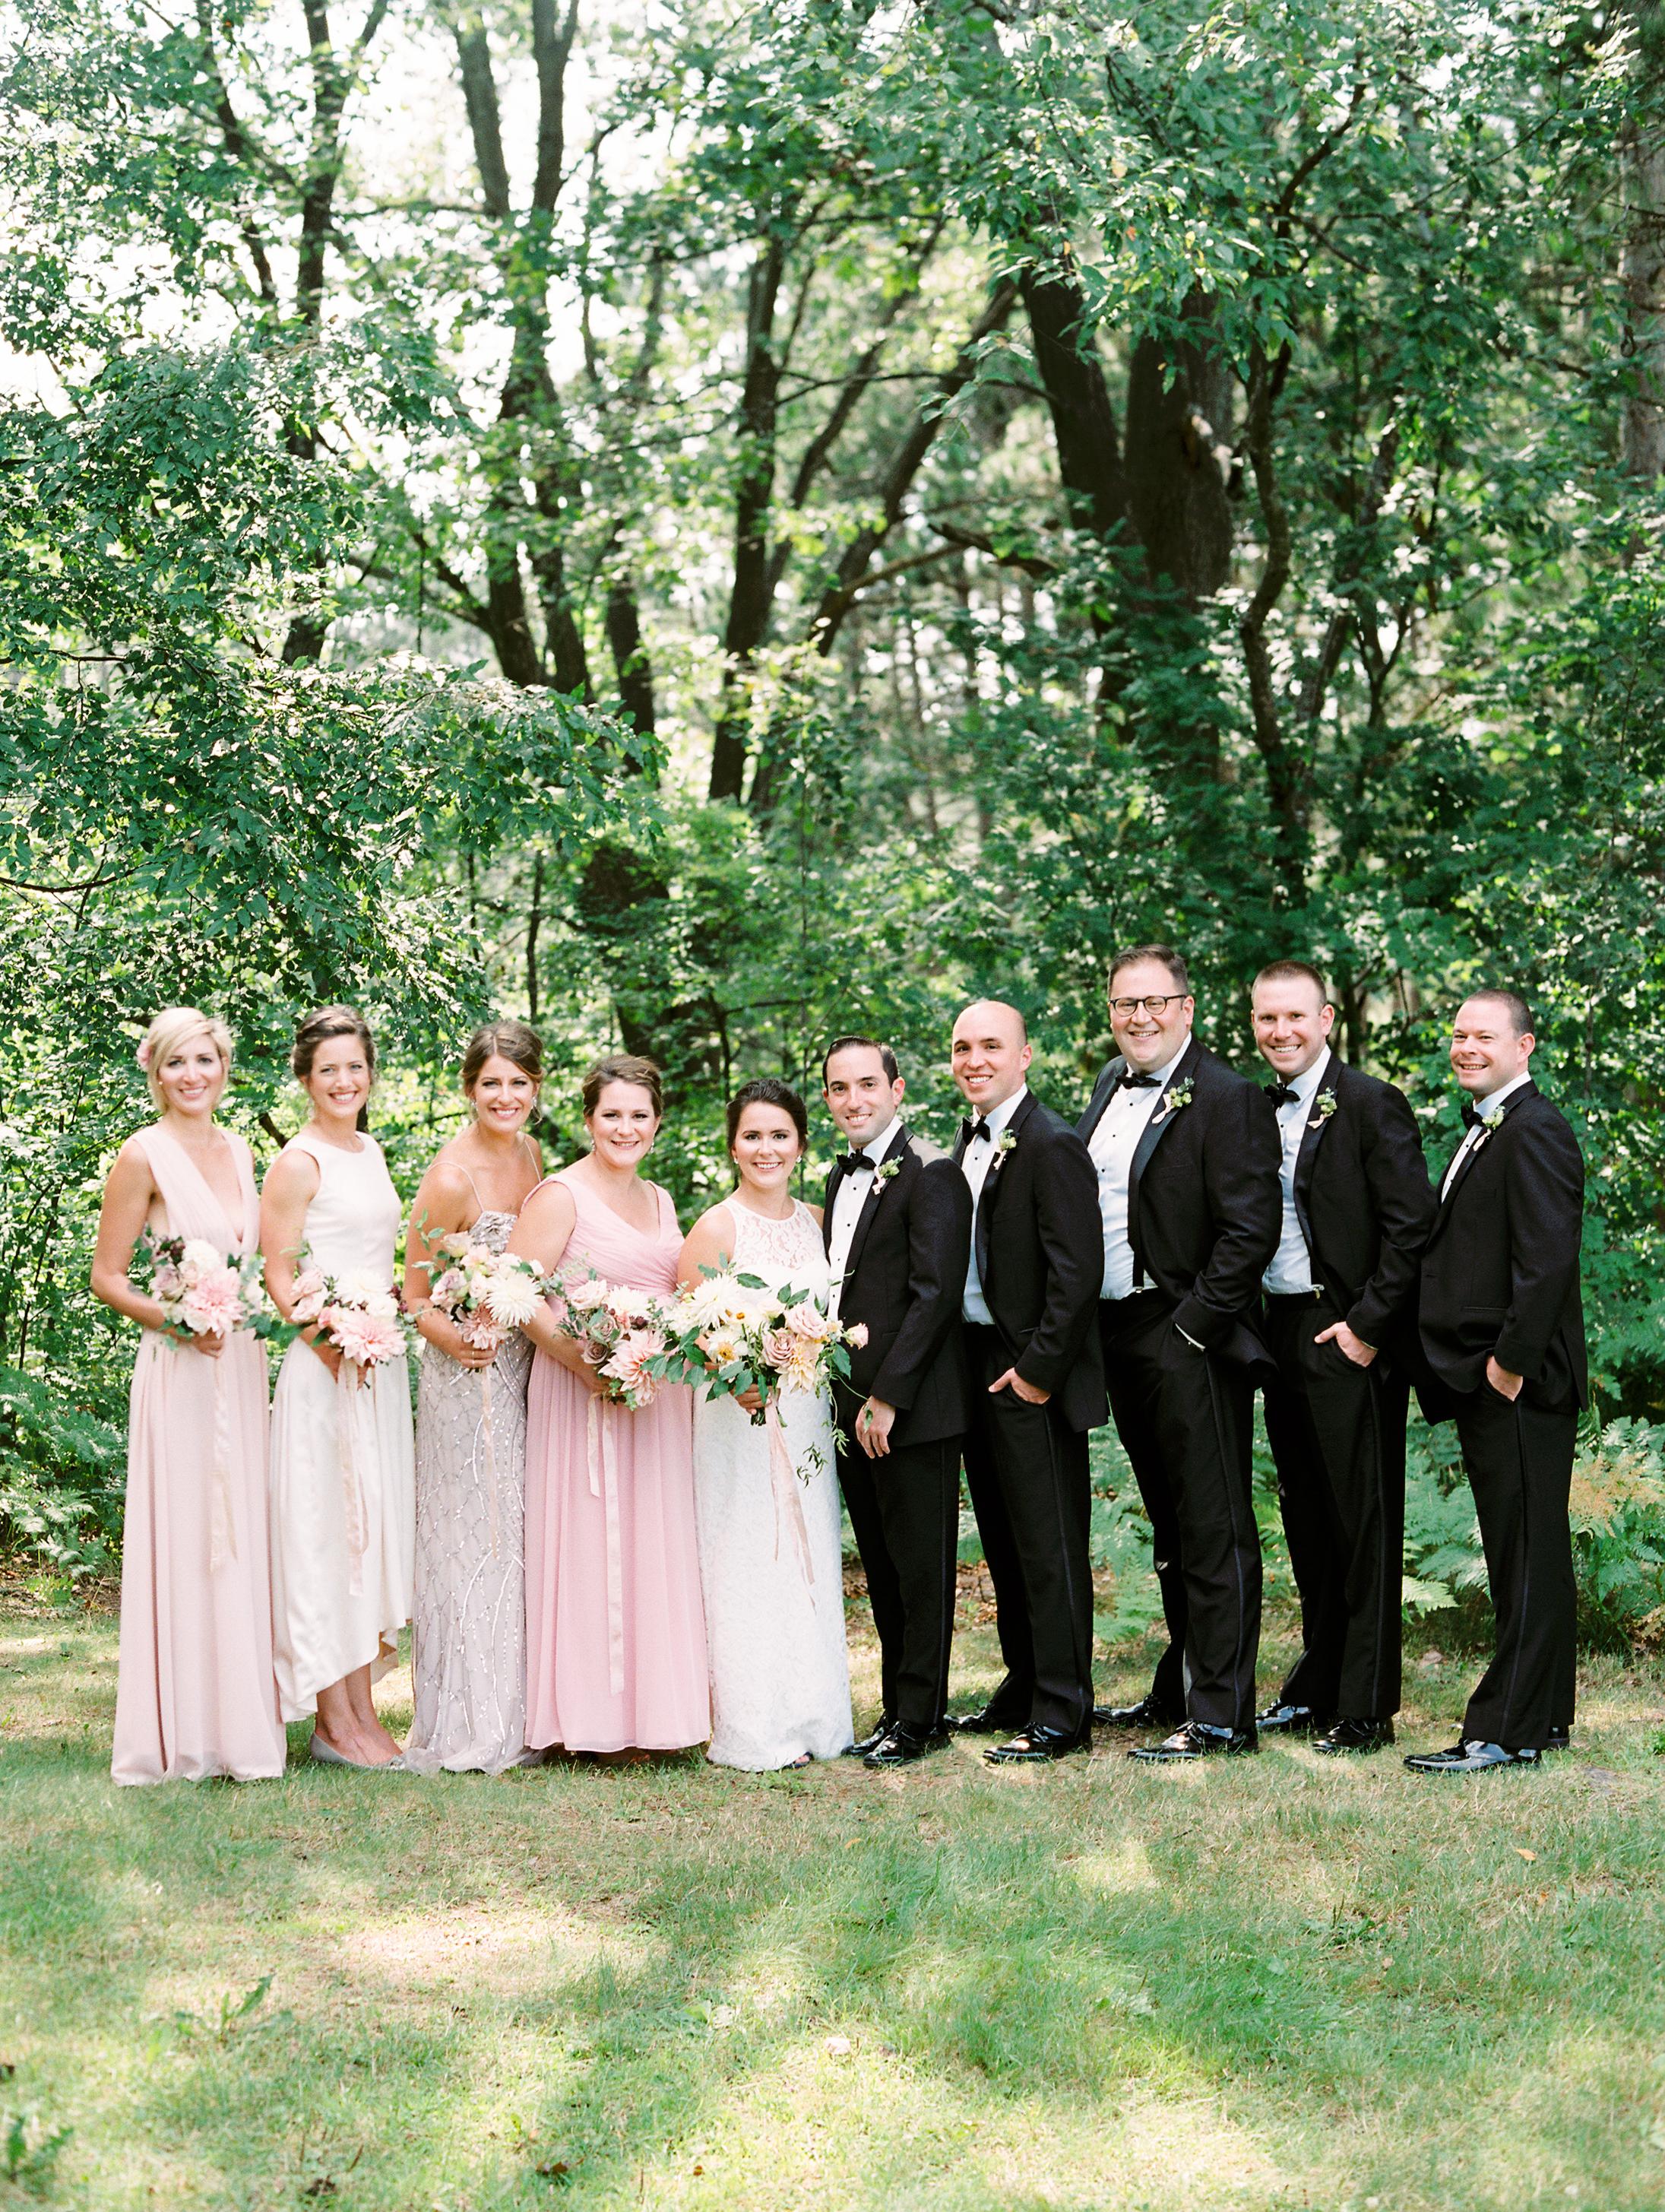 Zoller+Wedding+Bridal+Partyf-23.jpg